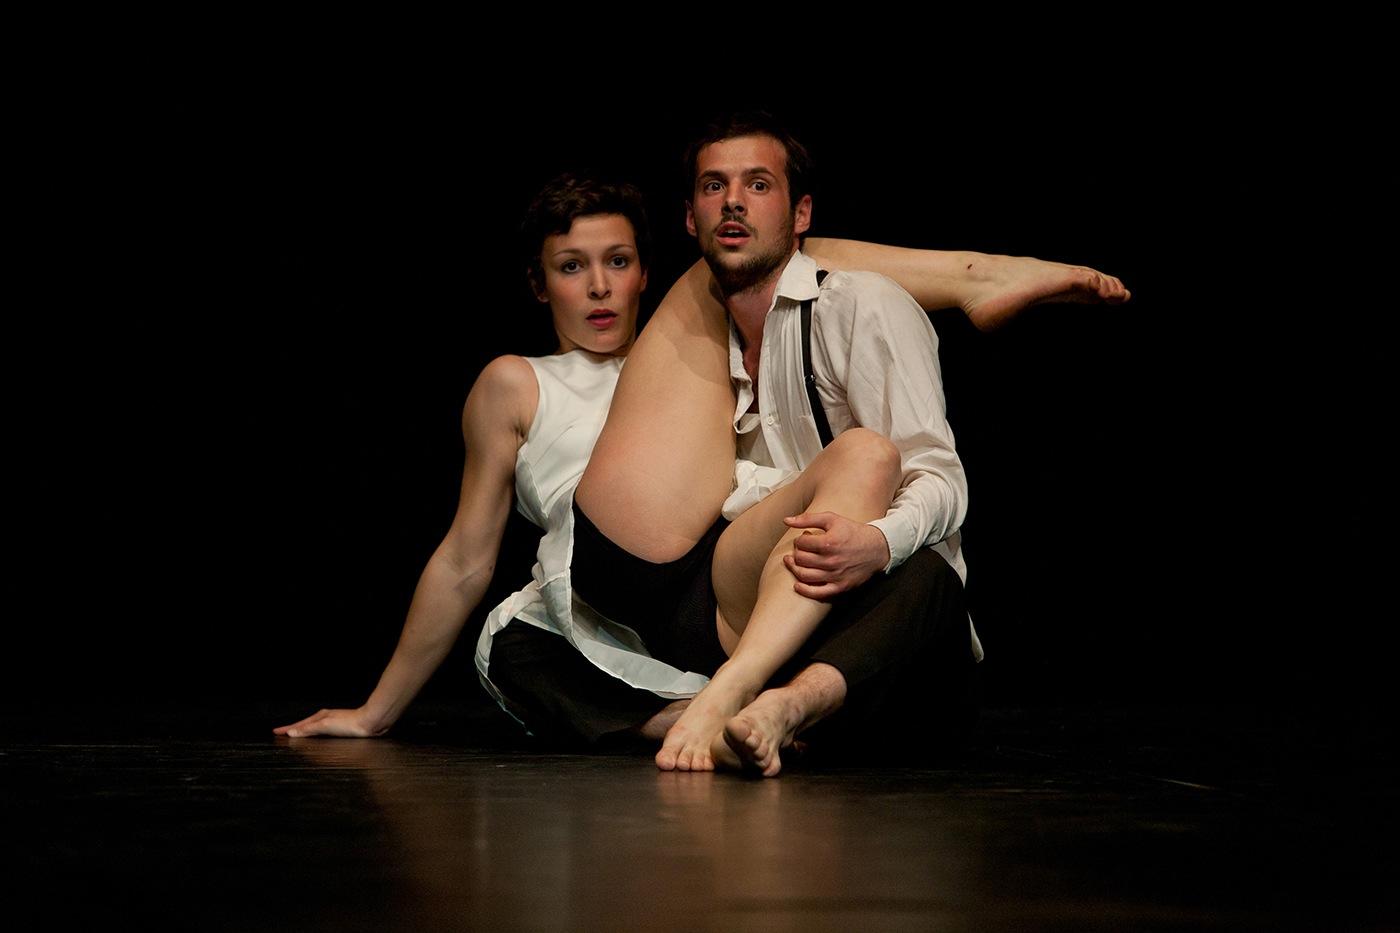 photographe-evenementiel-danse-guillaume-heraud-01-small-copie